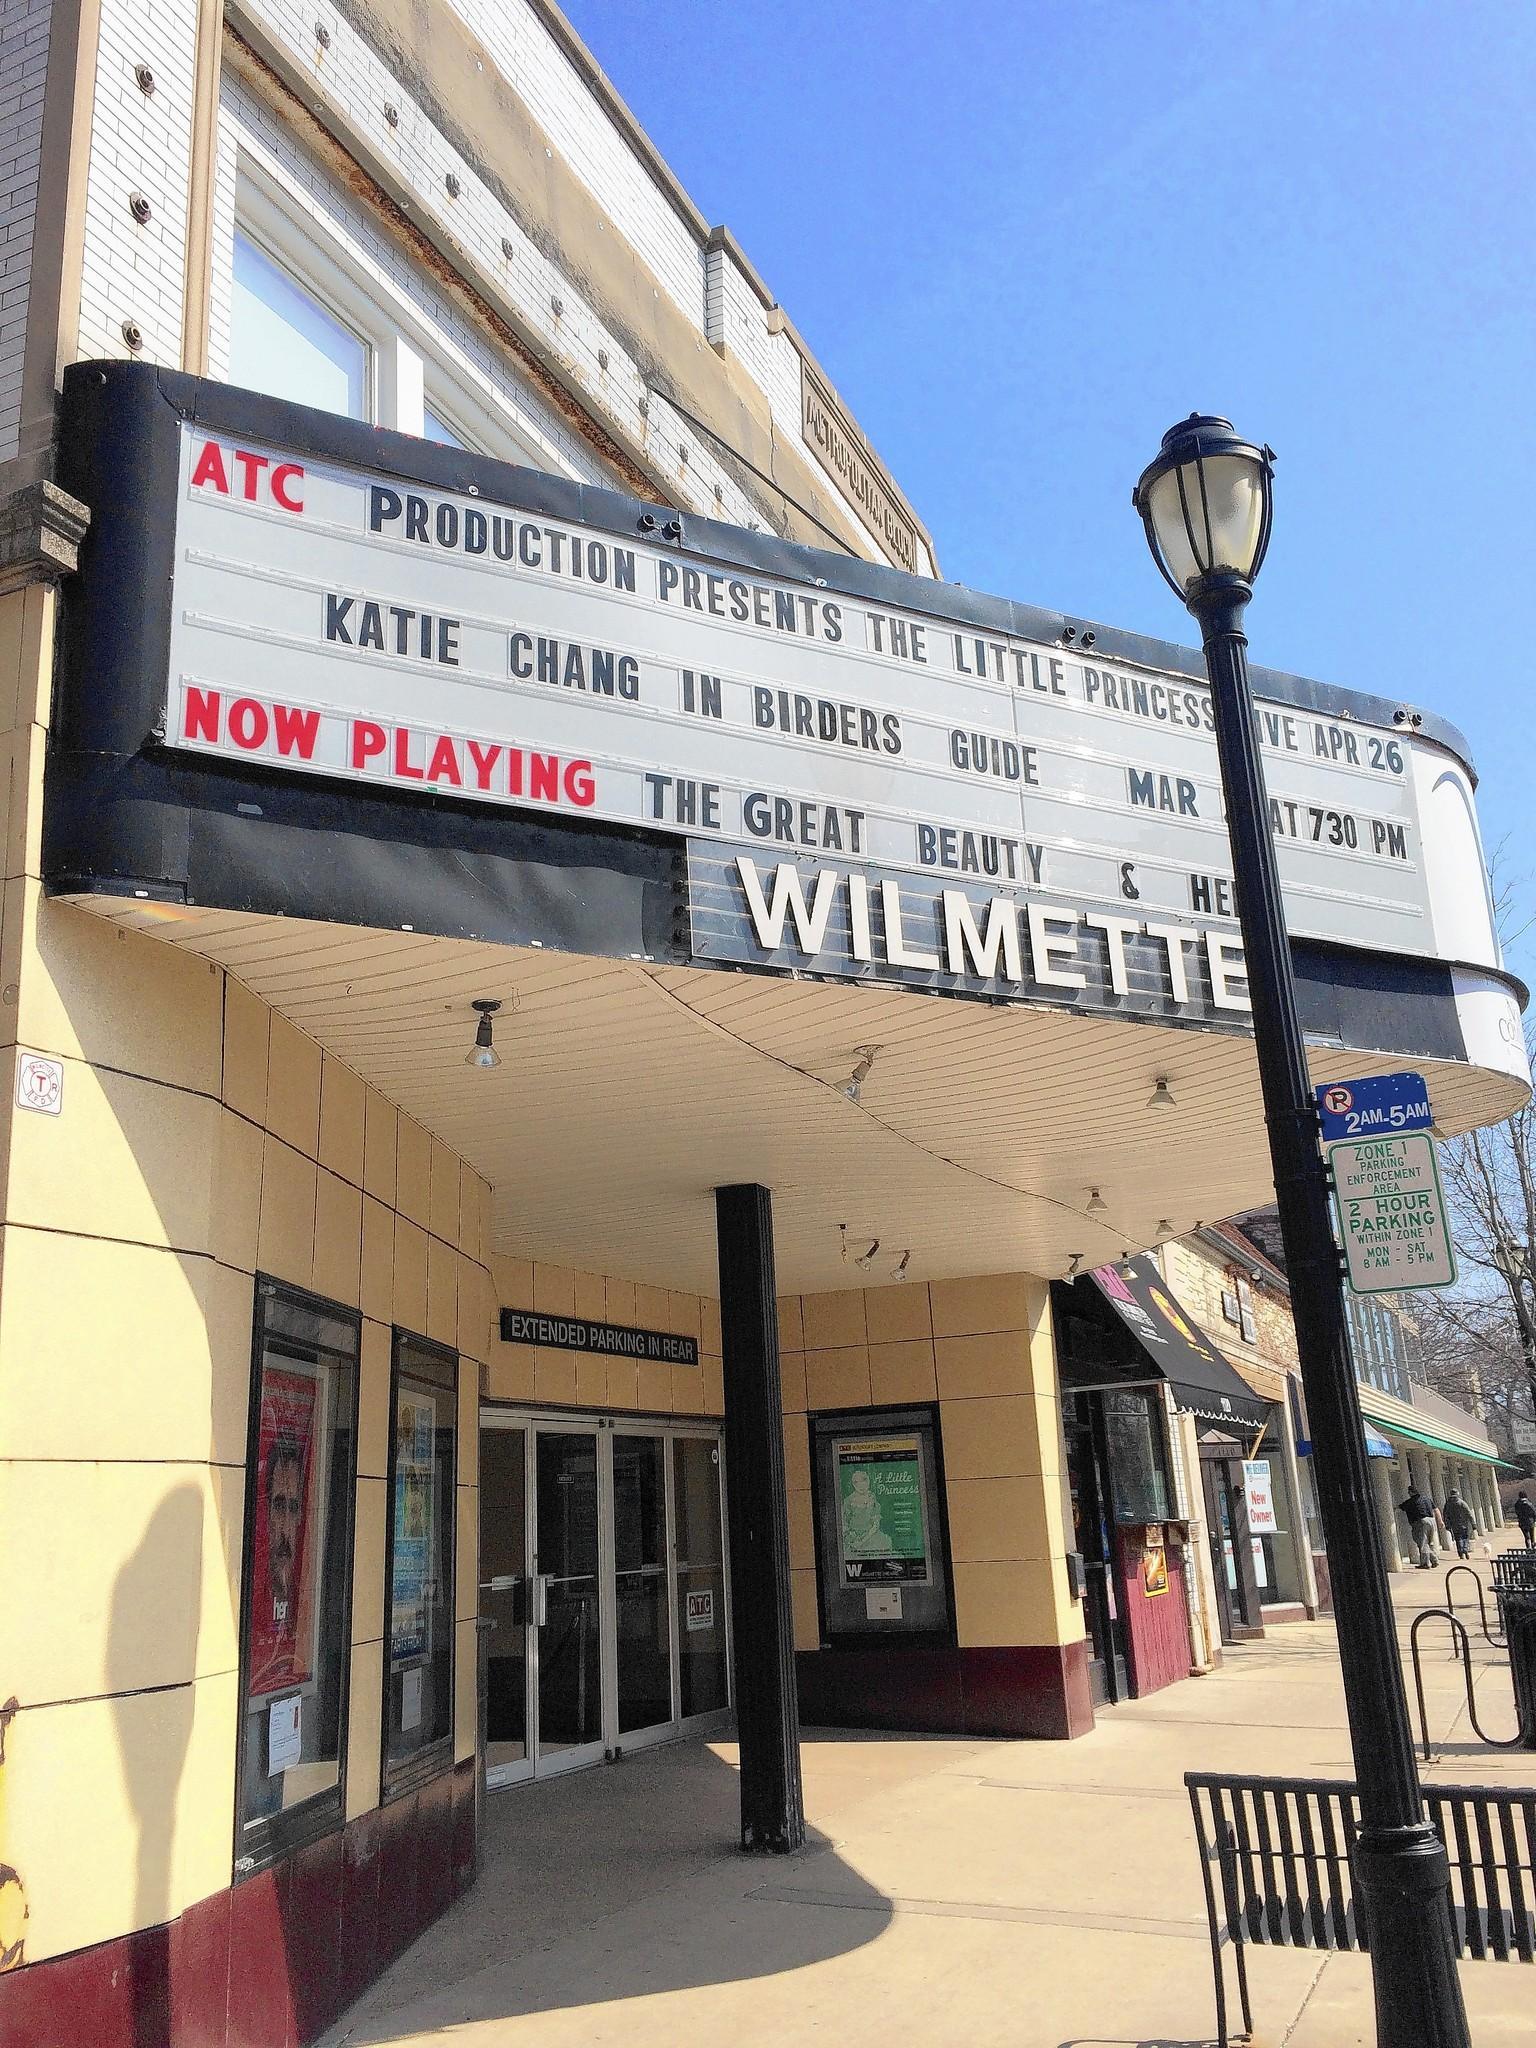 wilmette-theatre-jpg.jpg